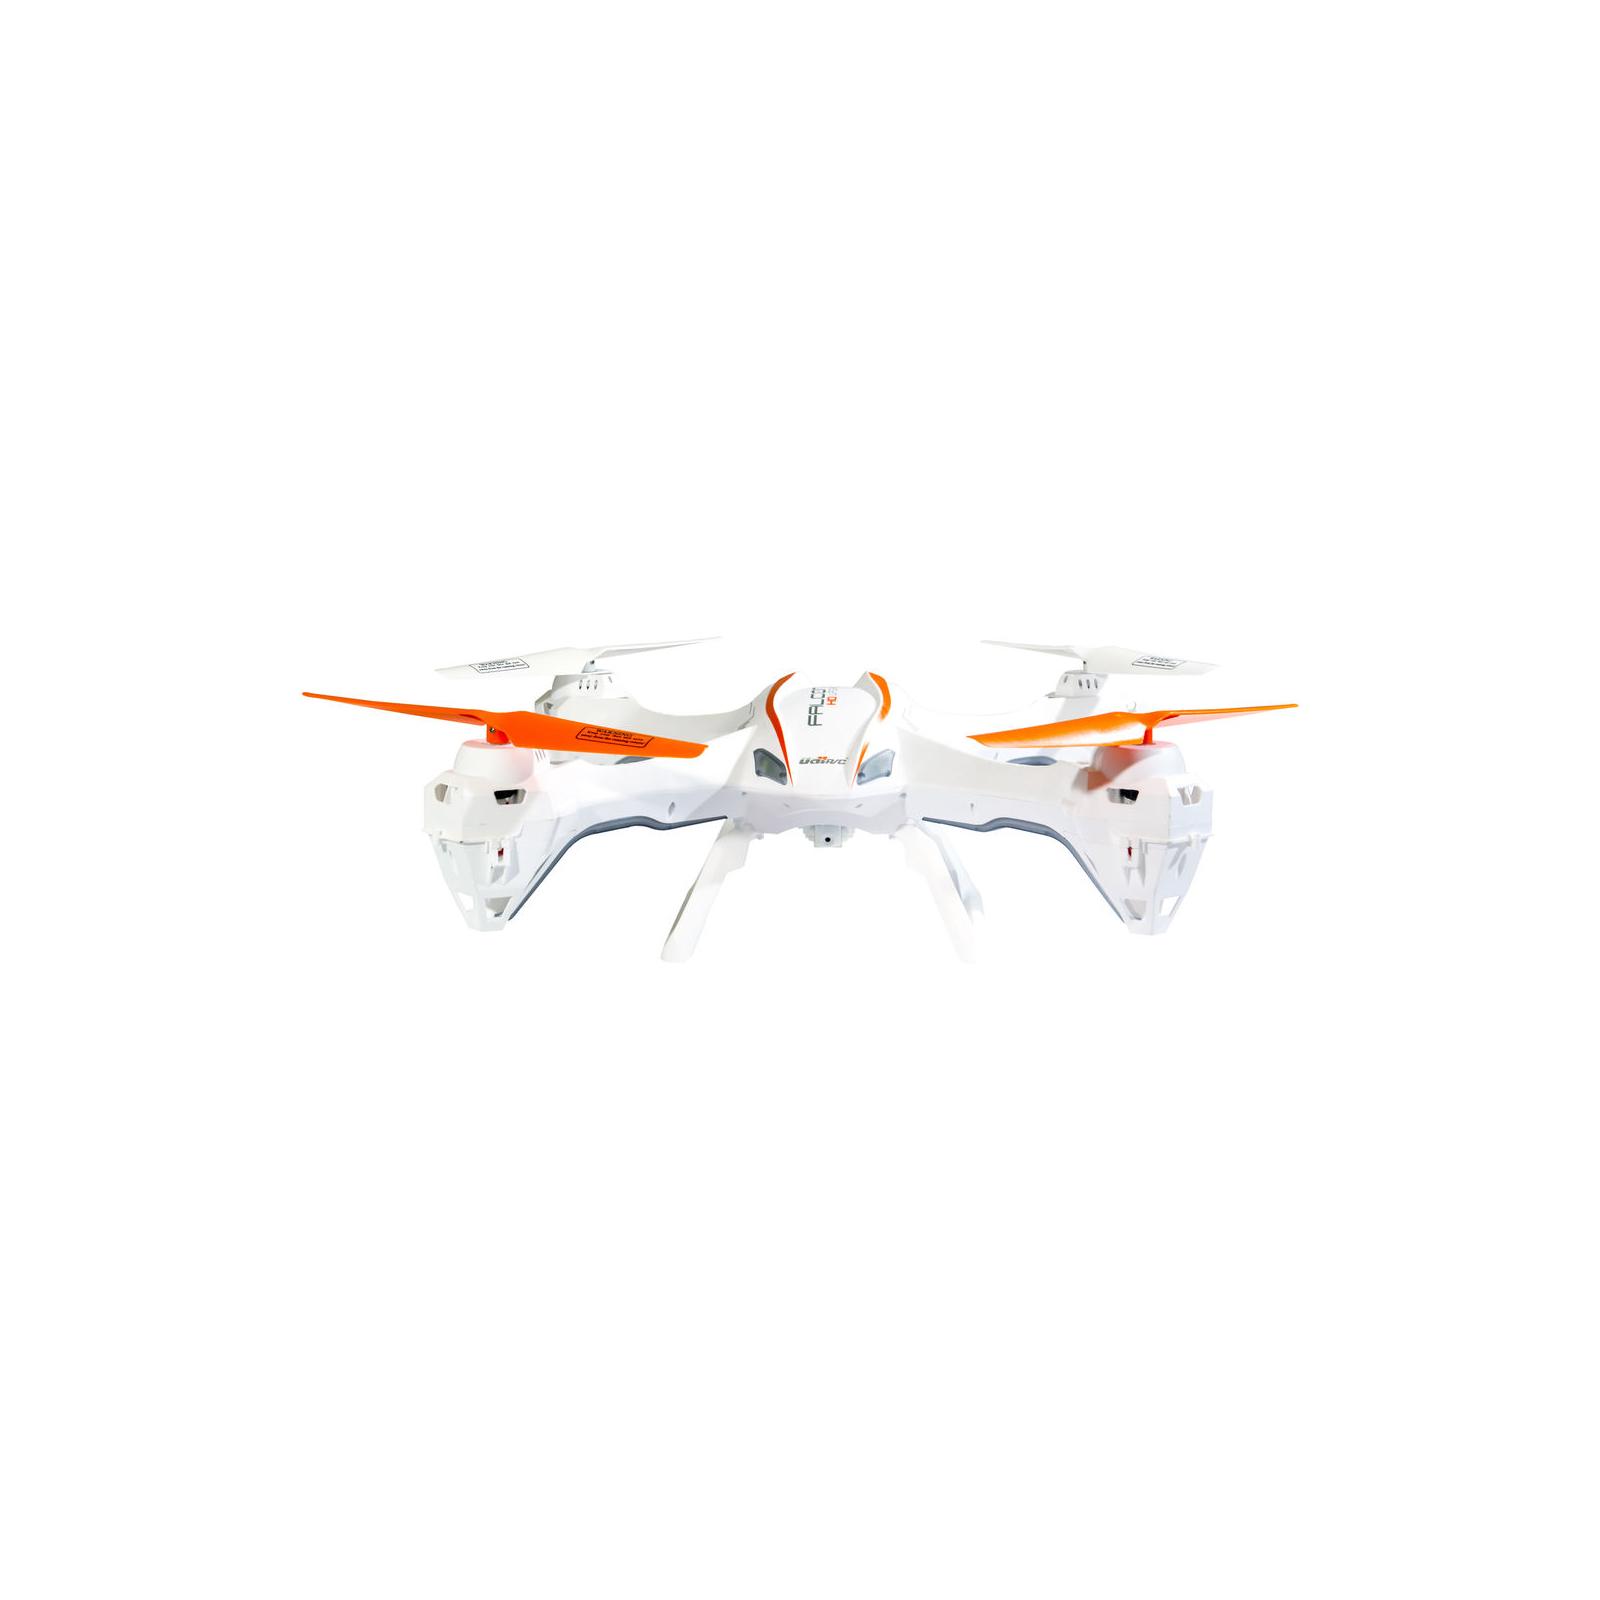 Квадрокоптер UDIRC U842 FALCON 2,4 GHz 486 мм HD бортовая камера 4CH (U842 White) изображение 2